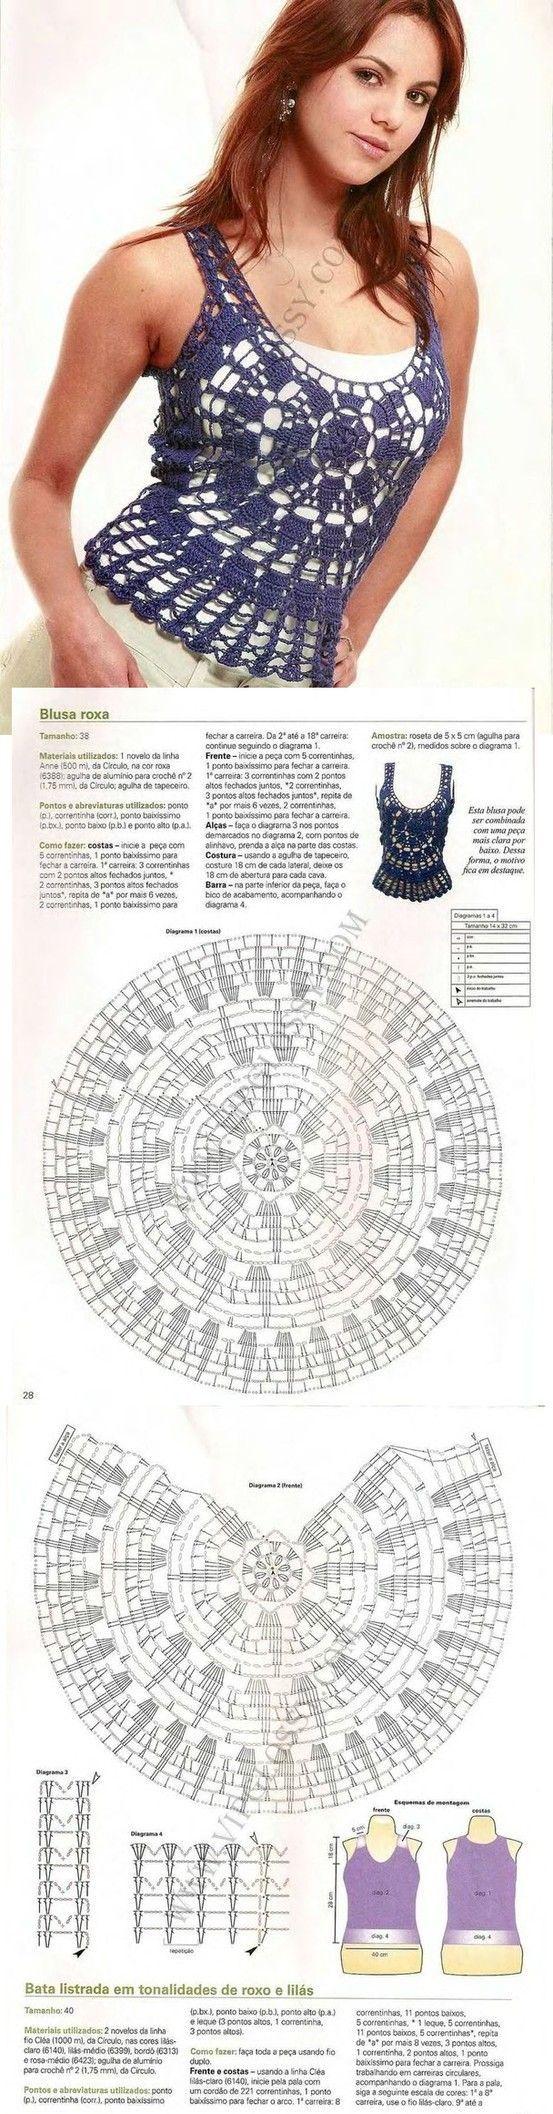 Luty Artes Crochet: Top em Crochê + PAP